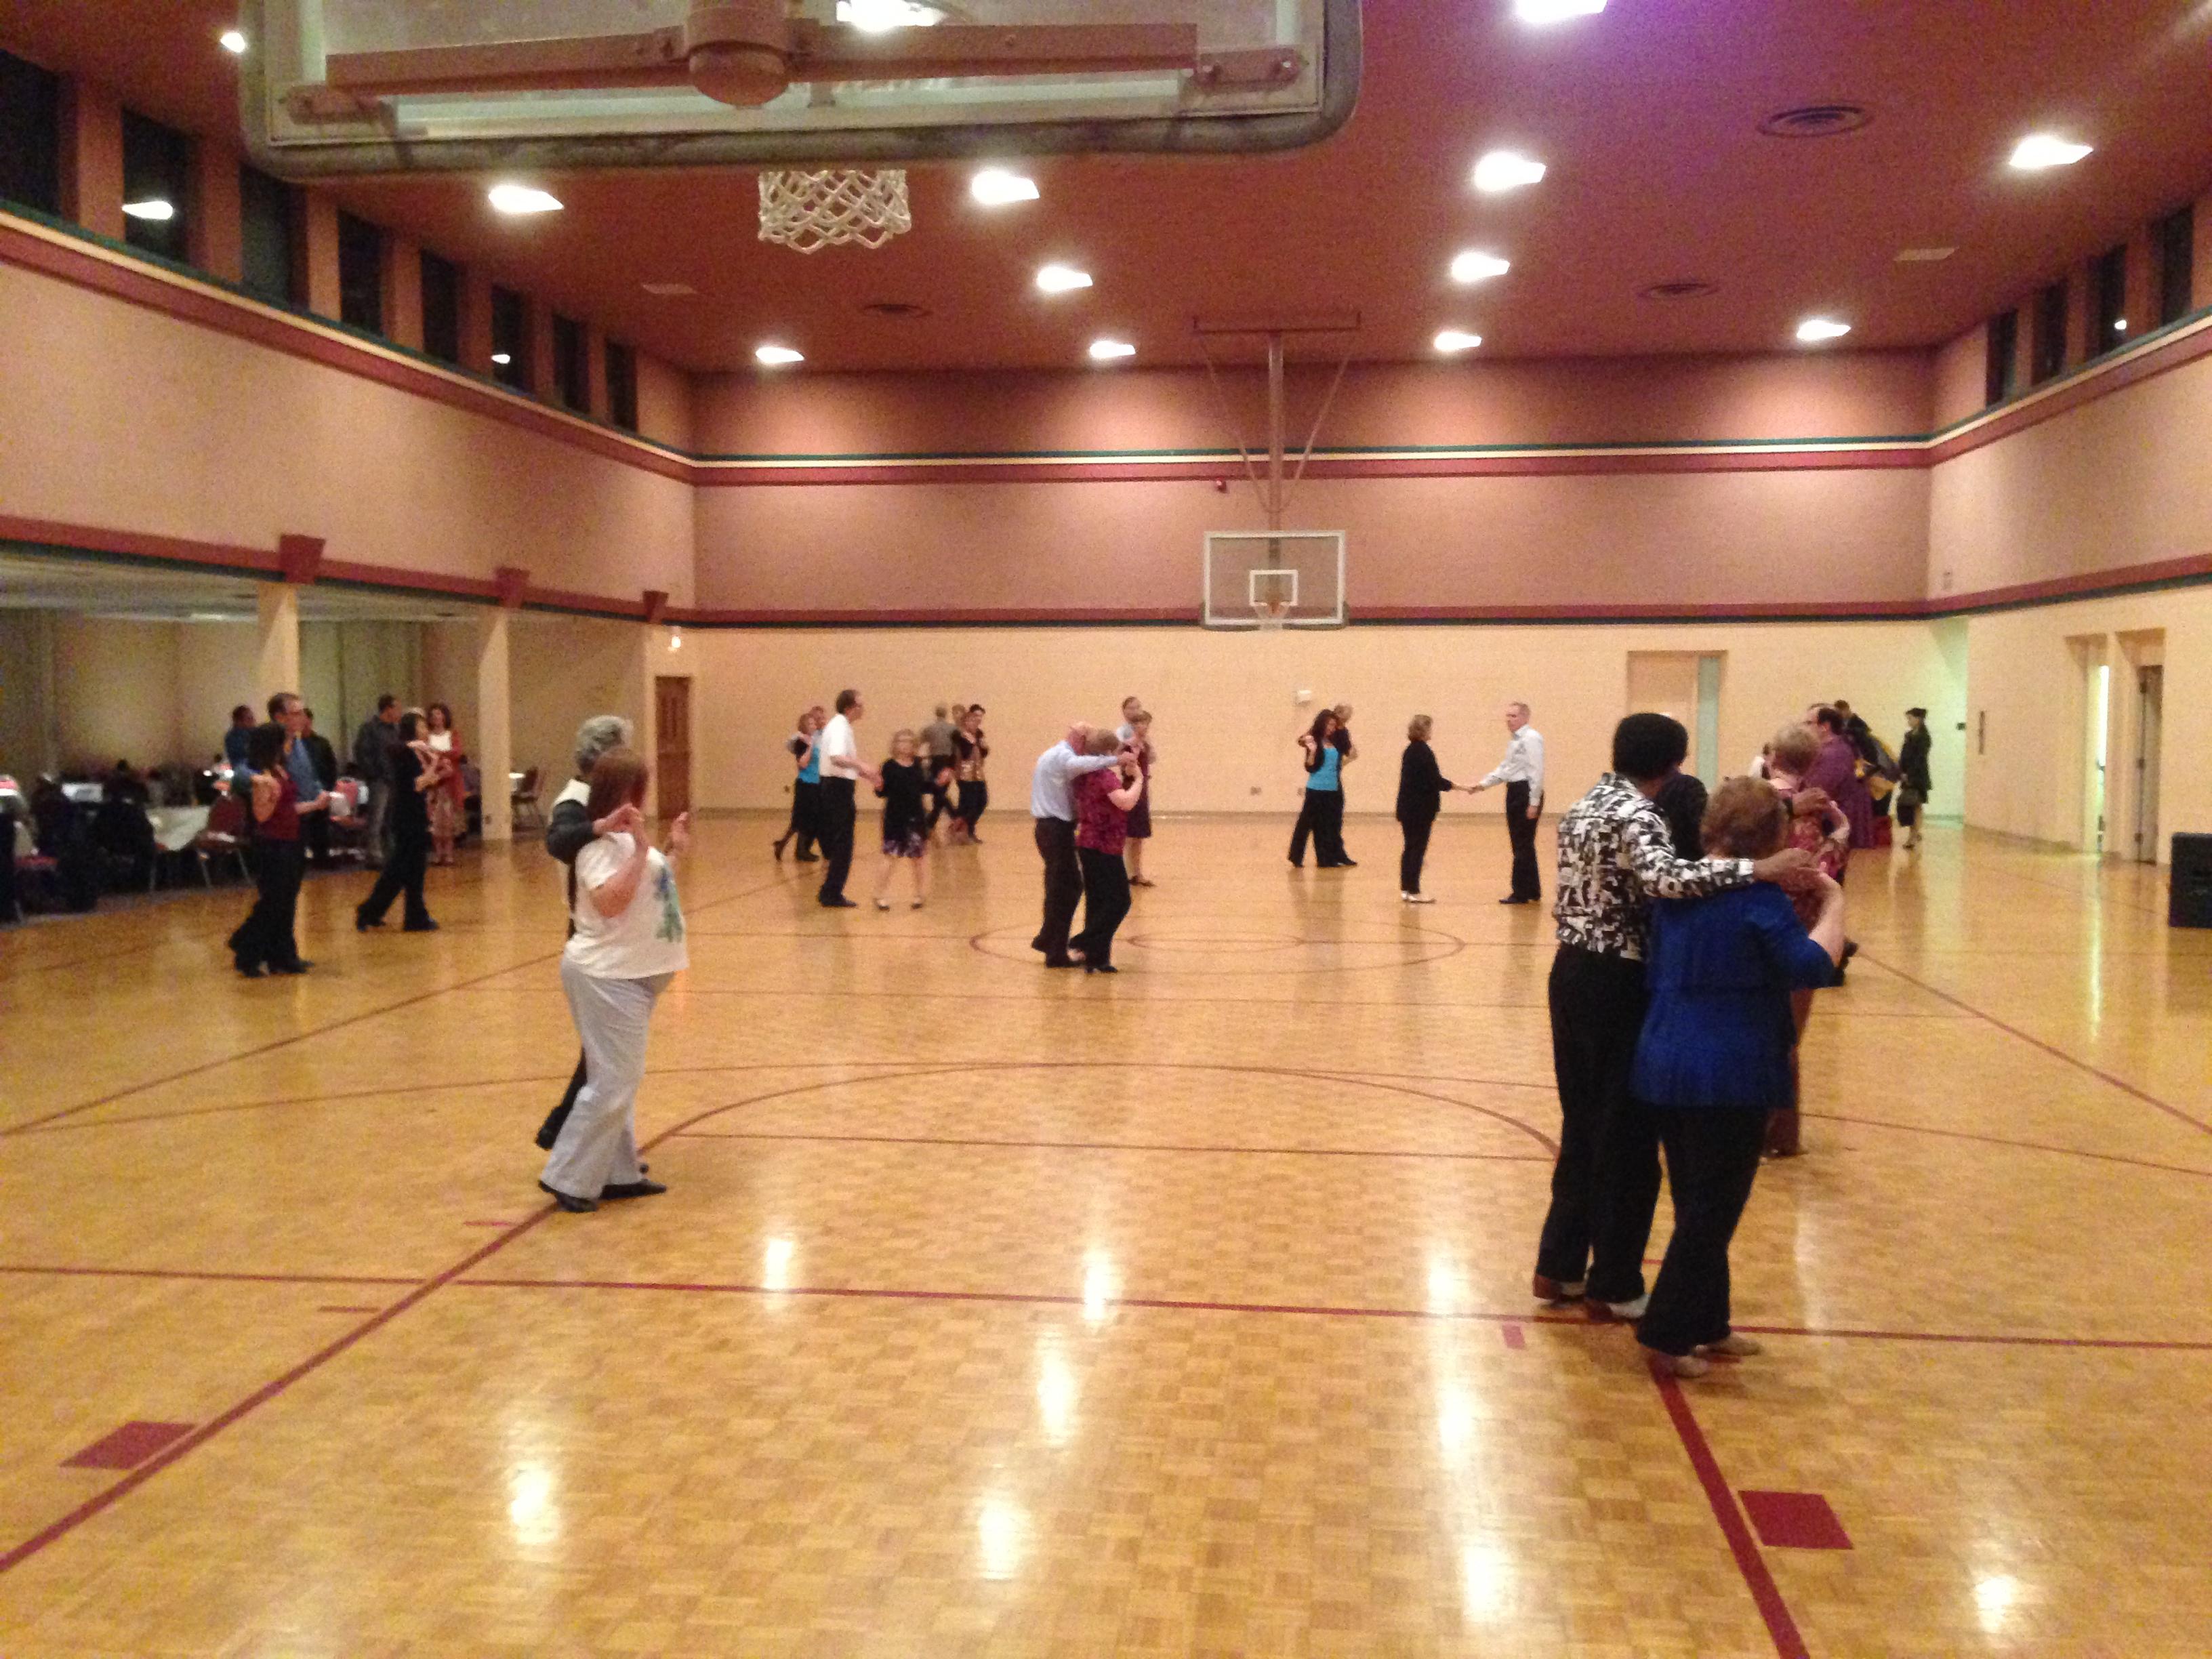 Nov 30th dance at the G.O.C